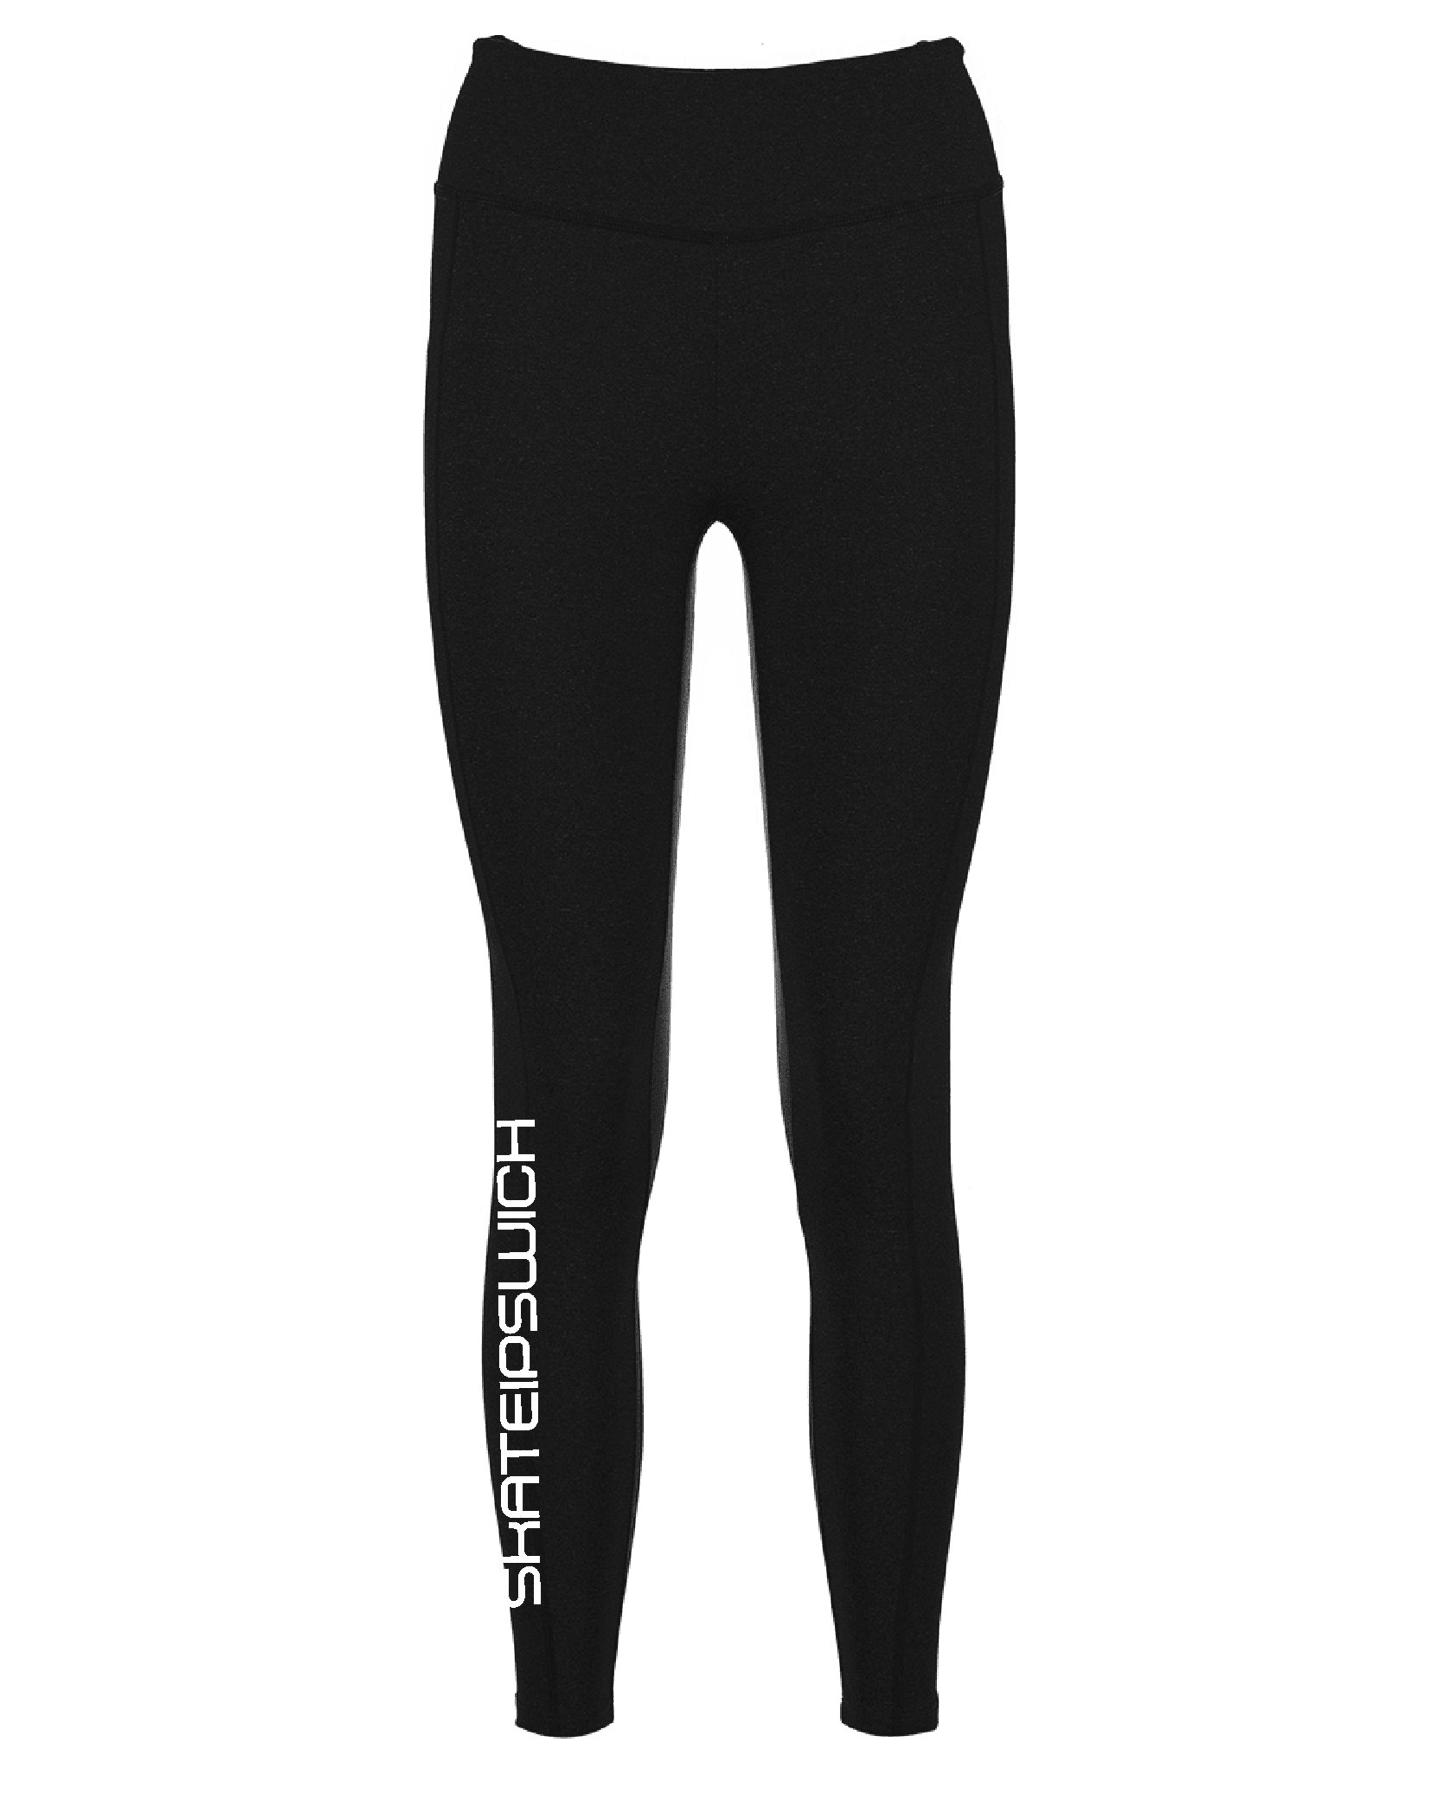 ISC – Gamegear Full Length Leggings (Ladies)